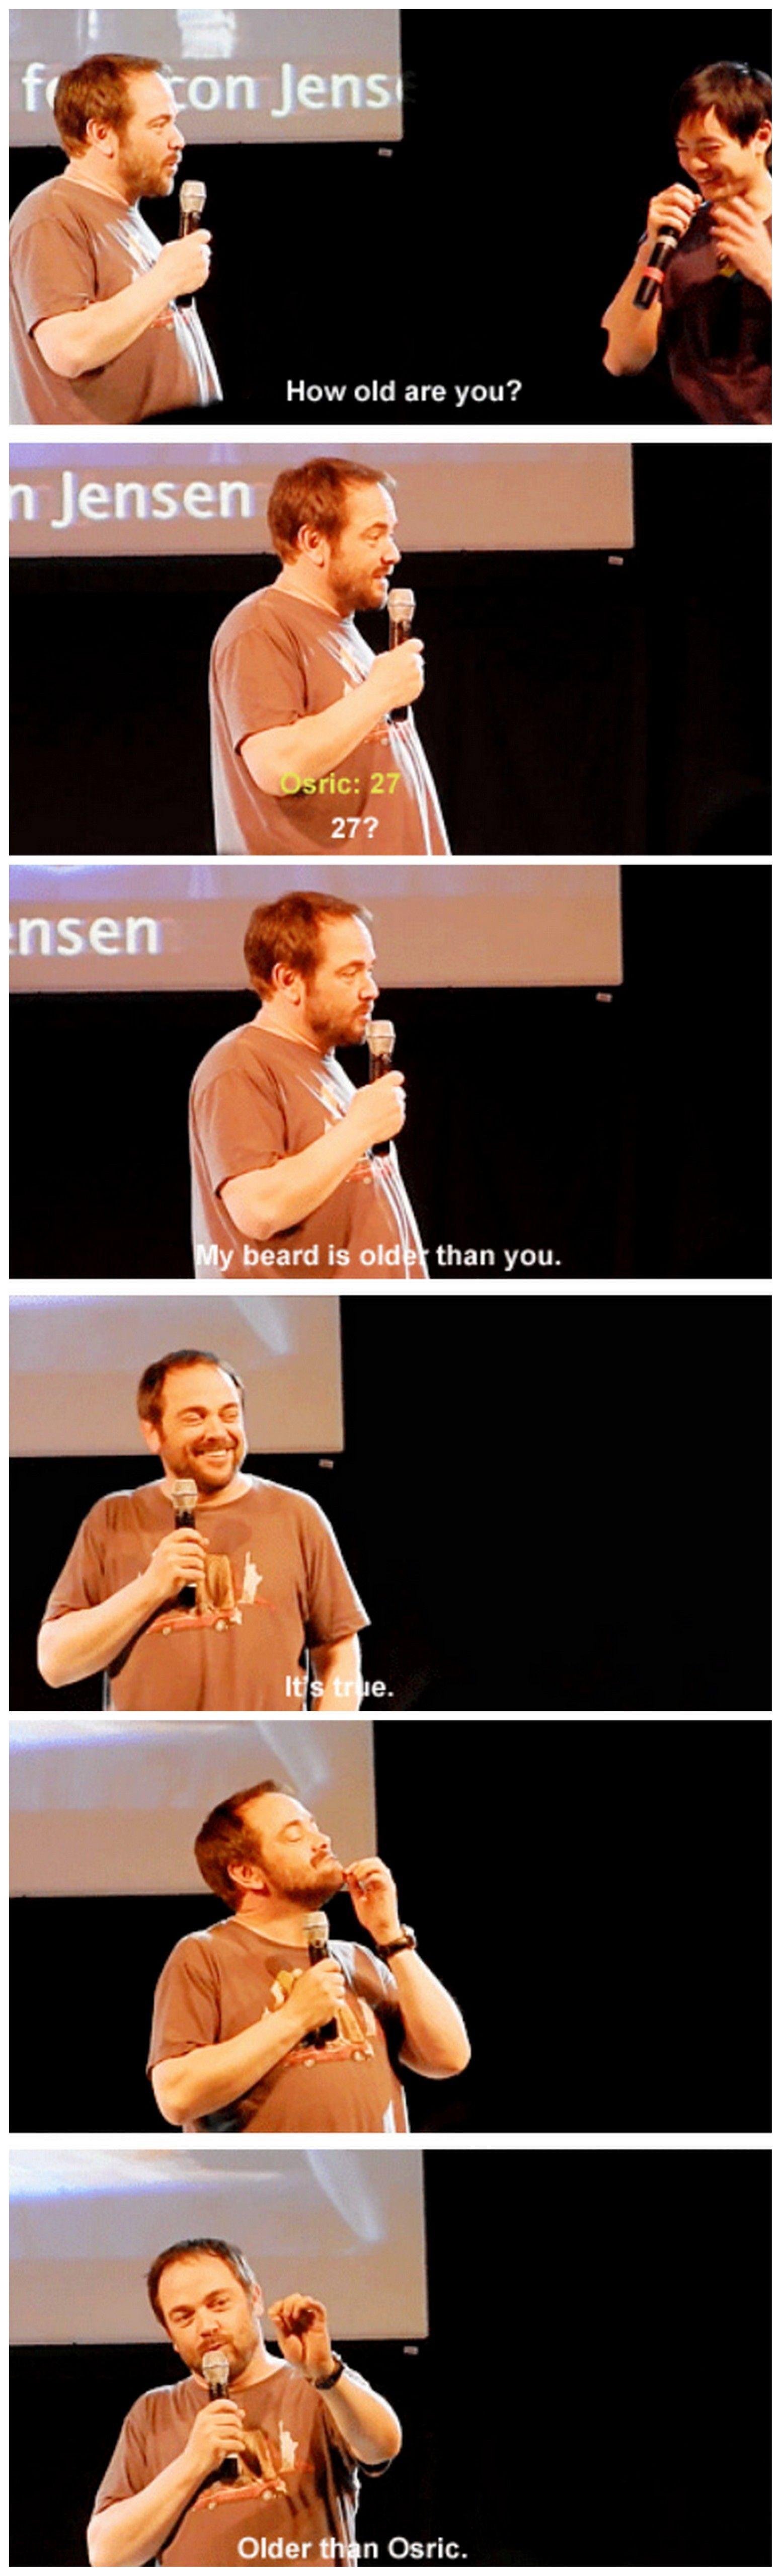 [gifset] Mark teasing Osric about his age :) #JibCon14 #MarkShepard #OsricChau